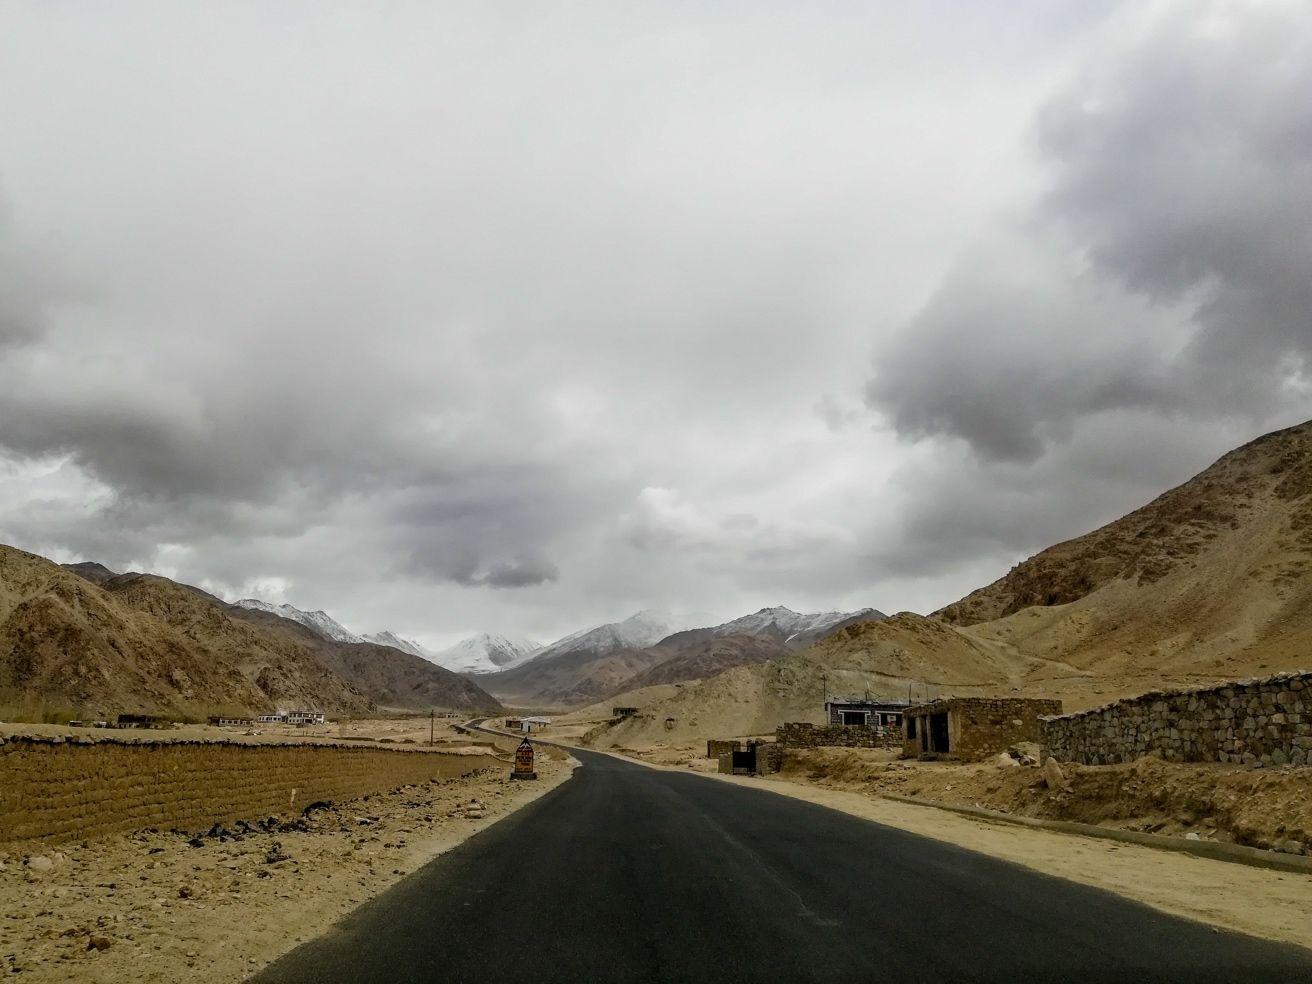 Photo of Chang La Pass By Vasu Devan M